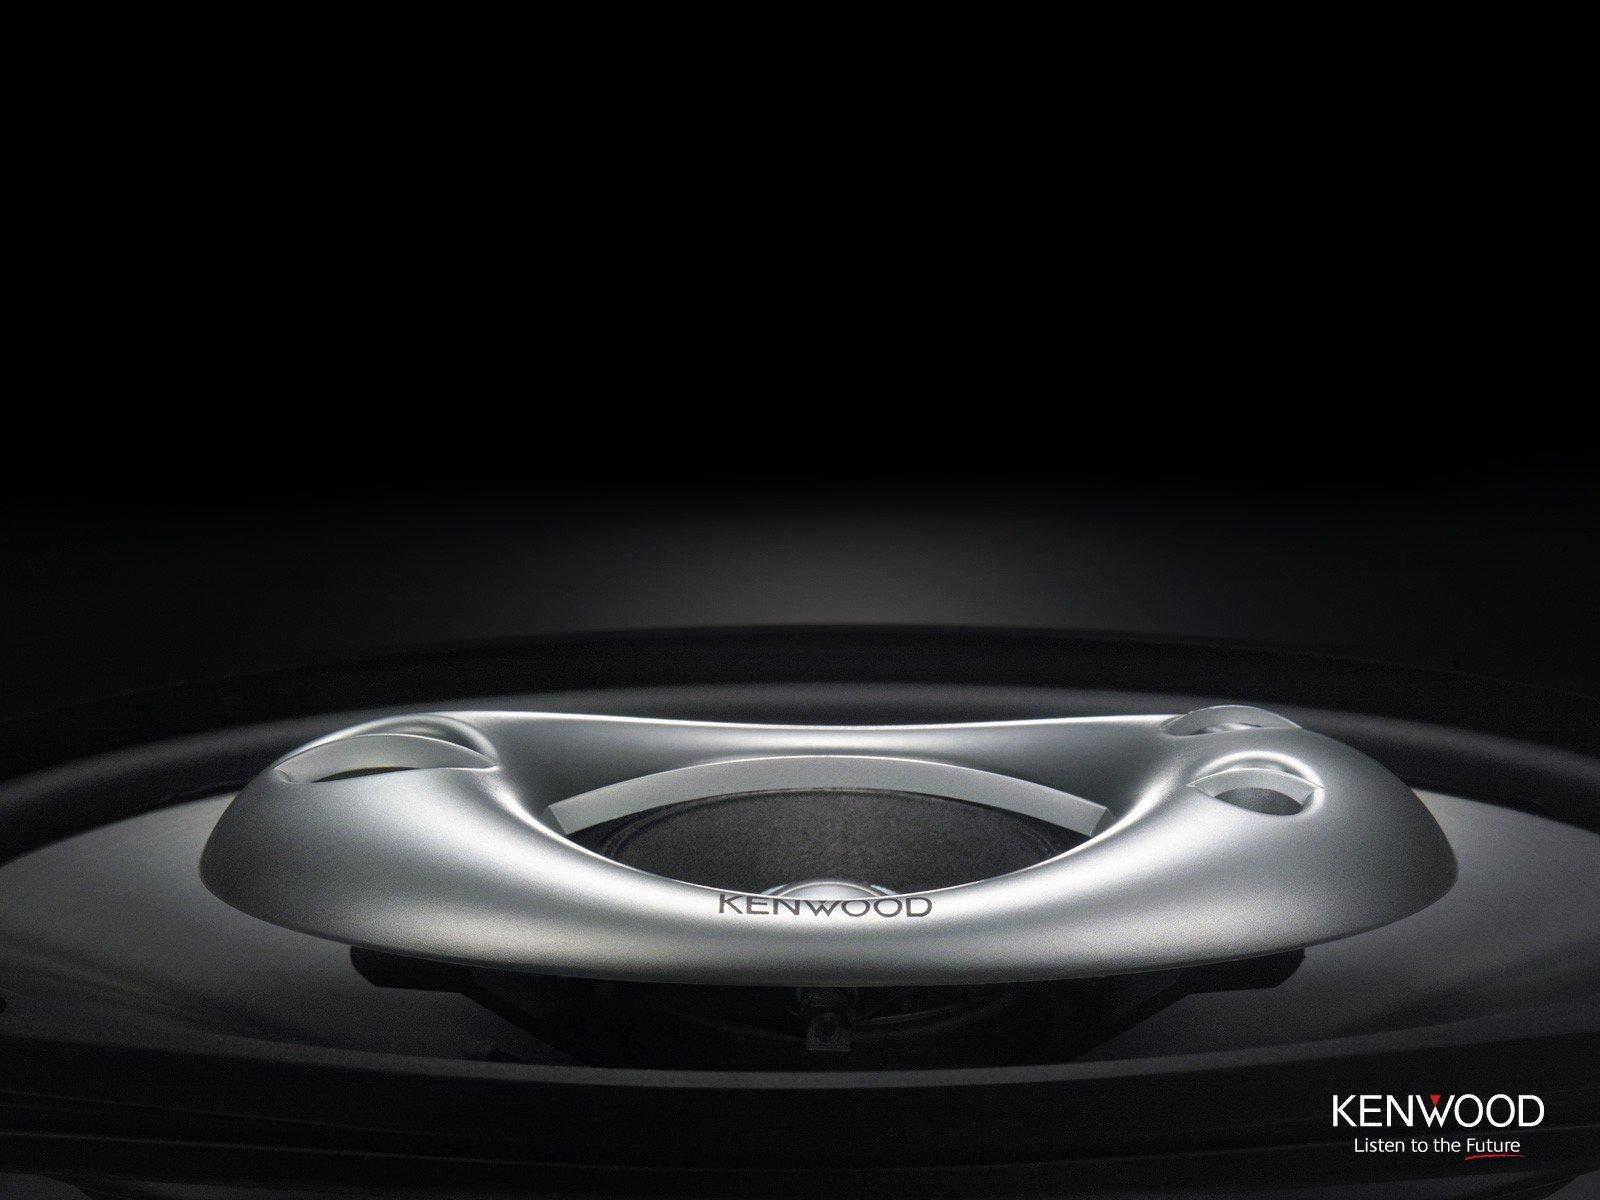 Wallpaper 1600x1200 Px Audio Car Kenwood Speakers 1600x1200 Wallup 1720815 Hd Wallpapers Wallhere